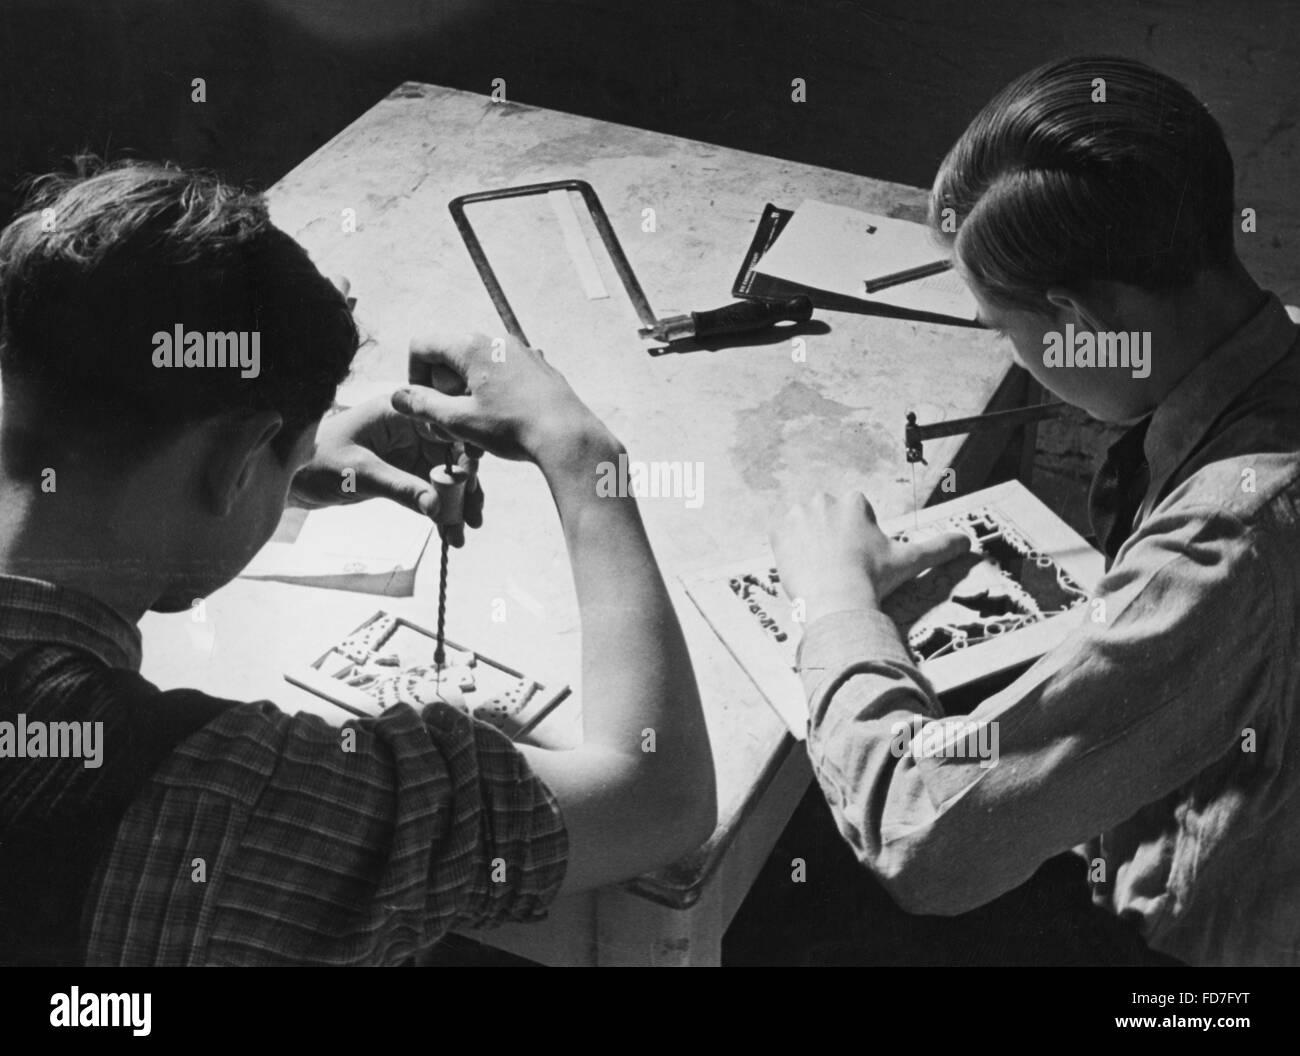 Boys working in thee NSV Kameradschaftshaus (comradeship house) Muelheim / Ruhr, 1939 - Stock Image